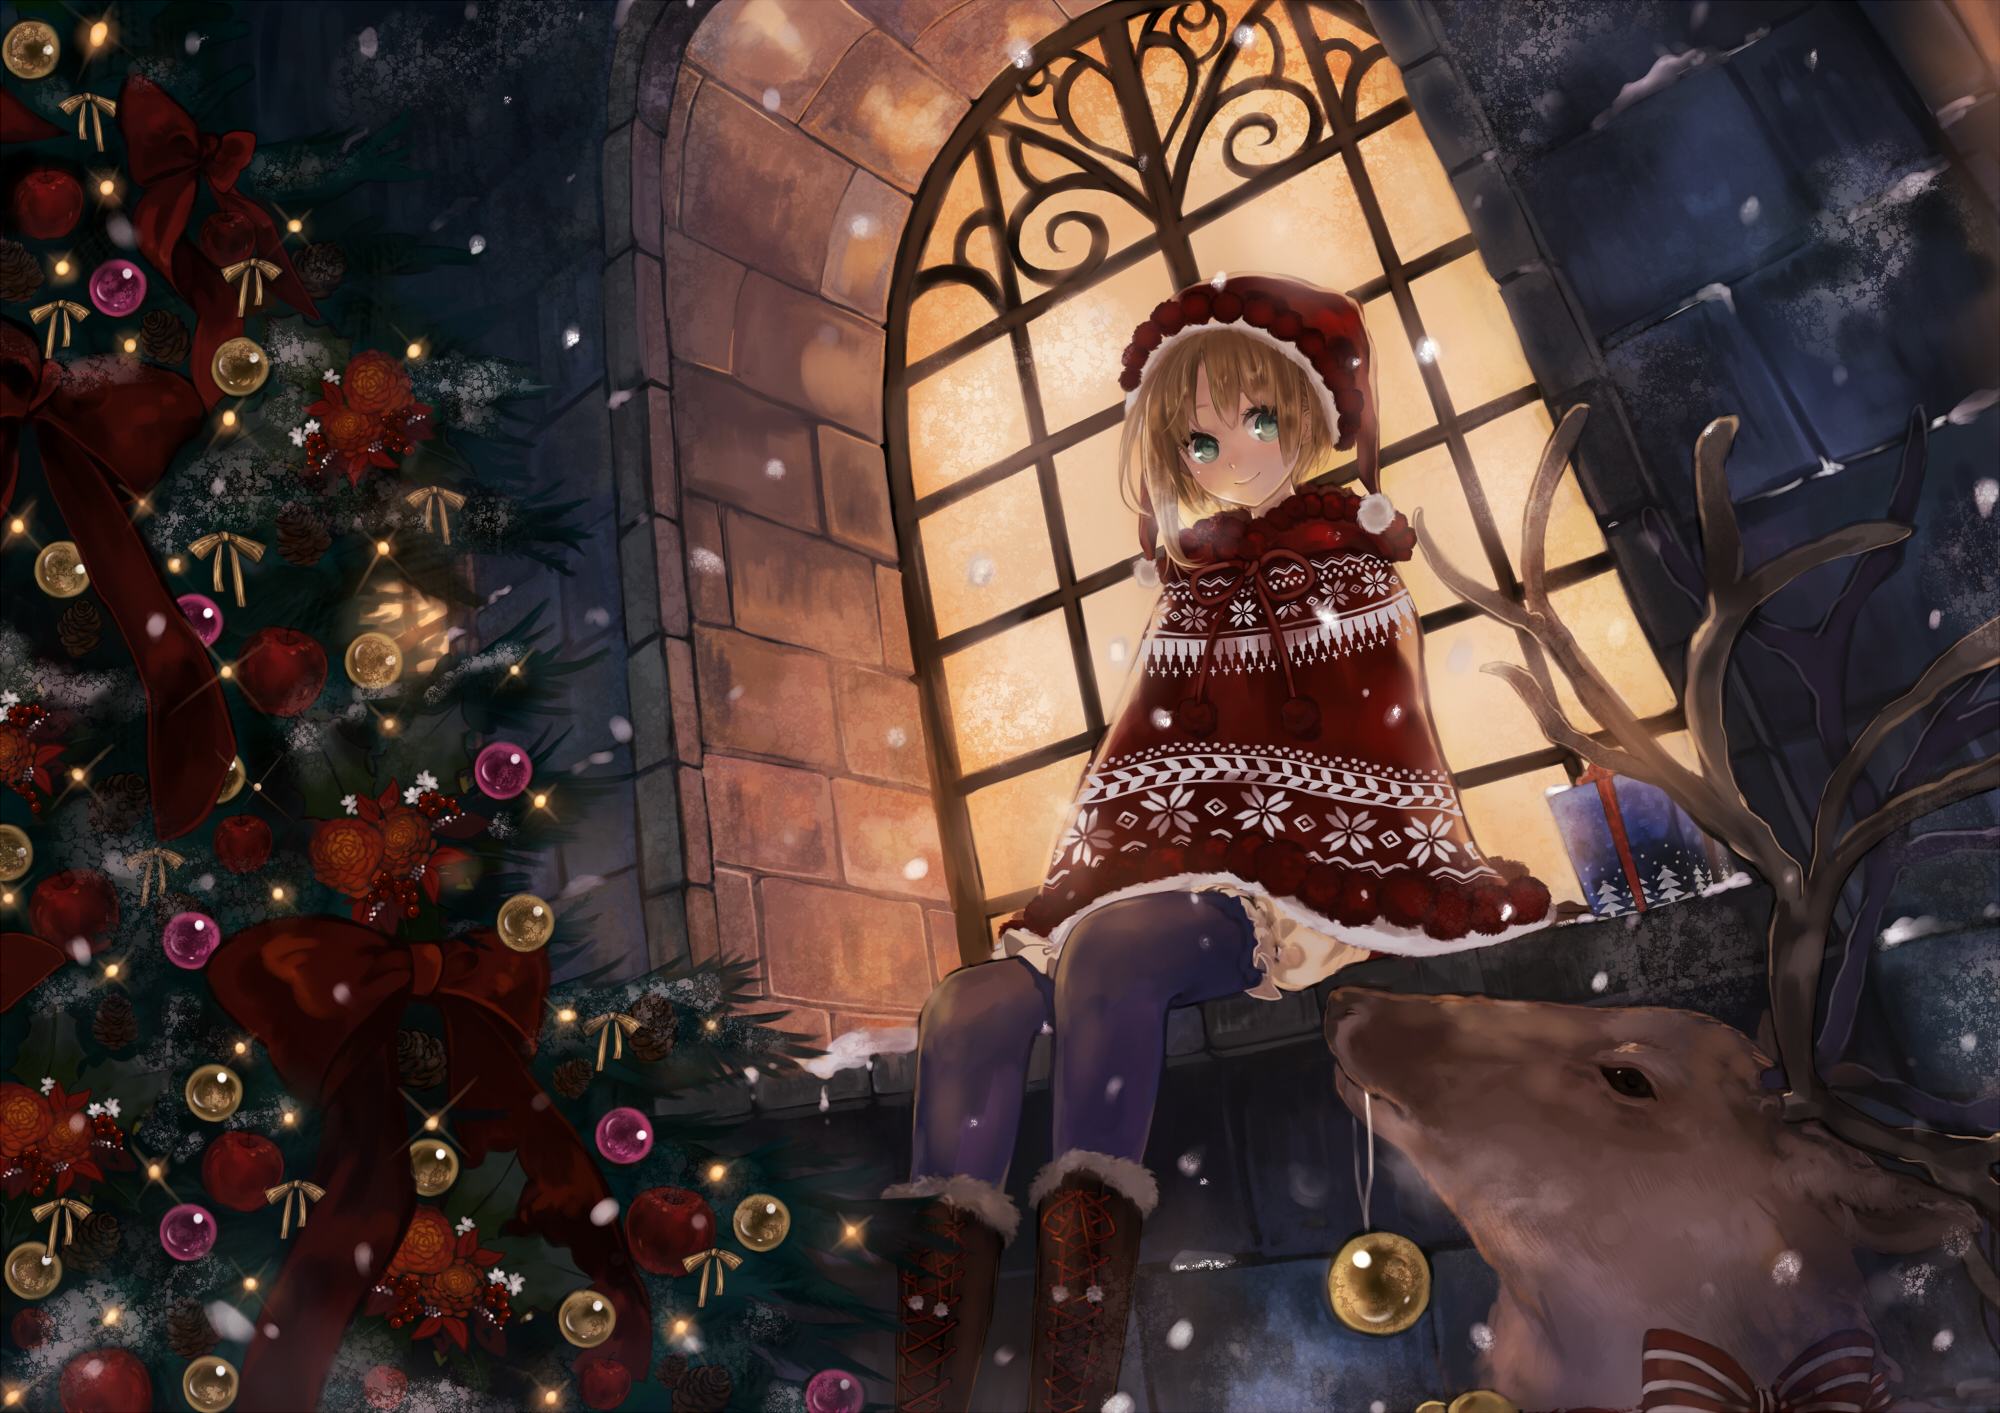 Merry X'mas (Pixiv ID: 15447116)